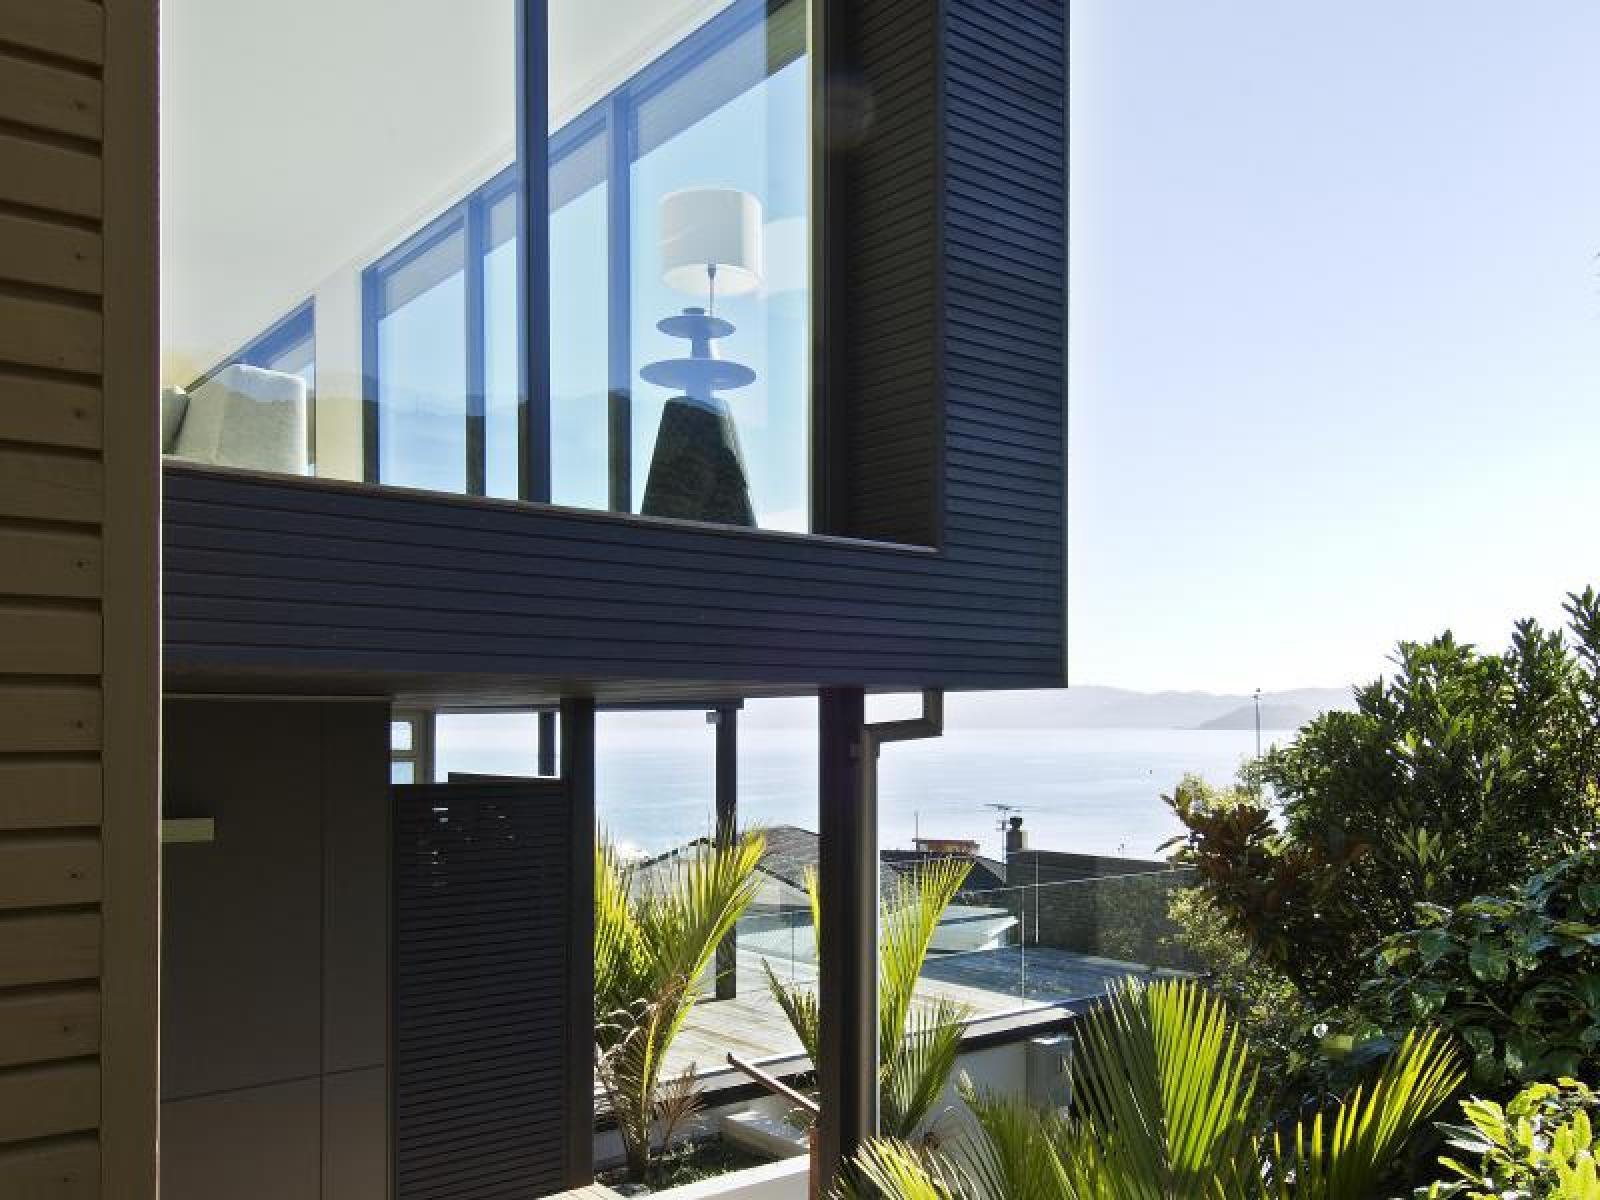 615A Marine Drive, Days Bay, Eastbourne